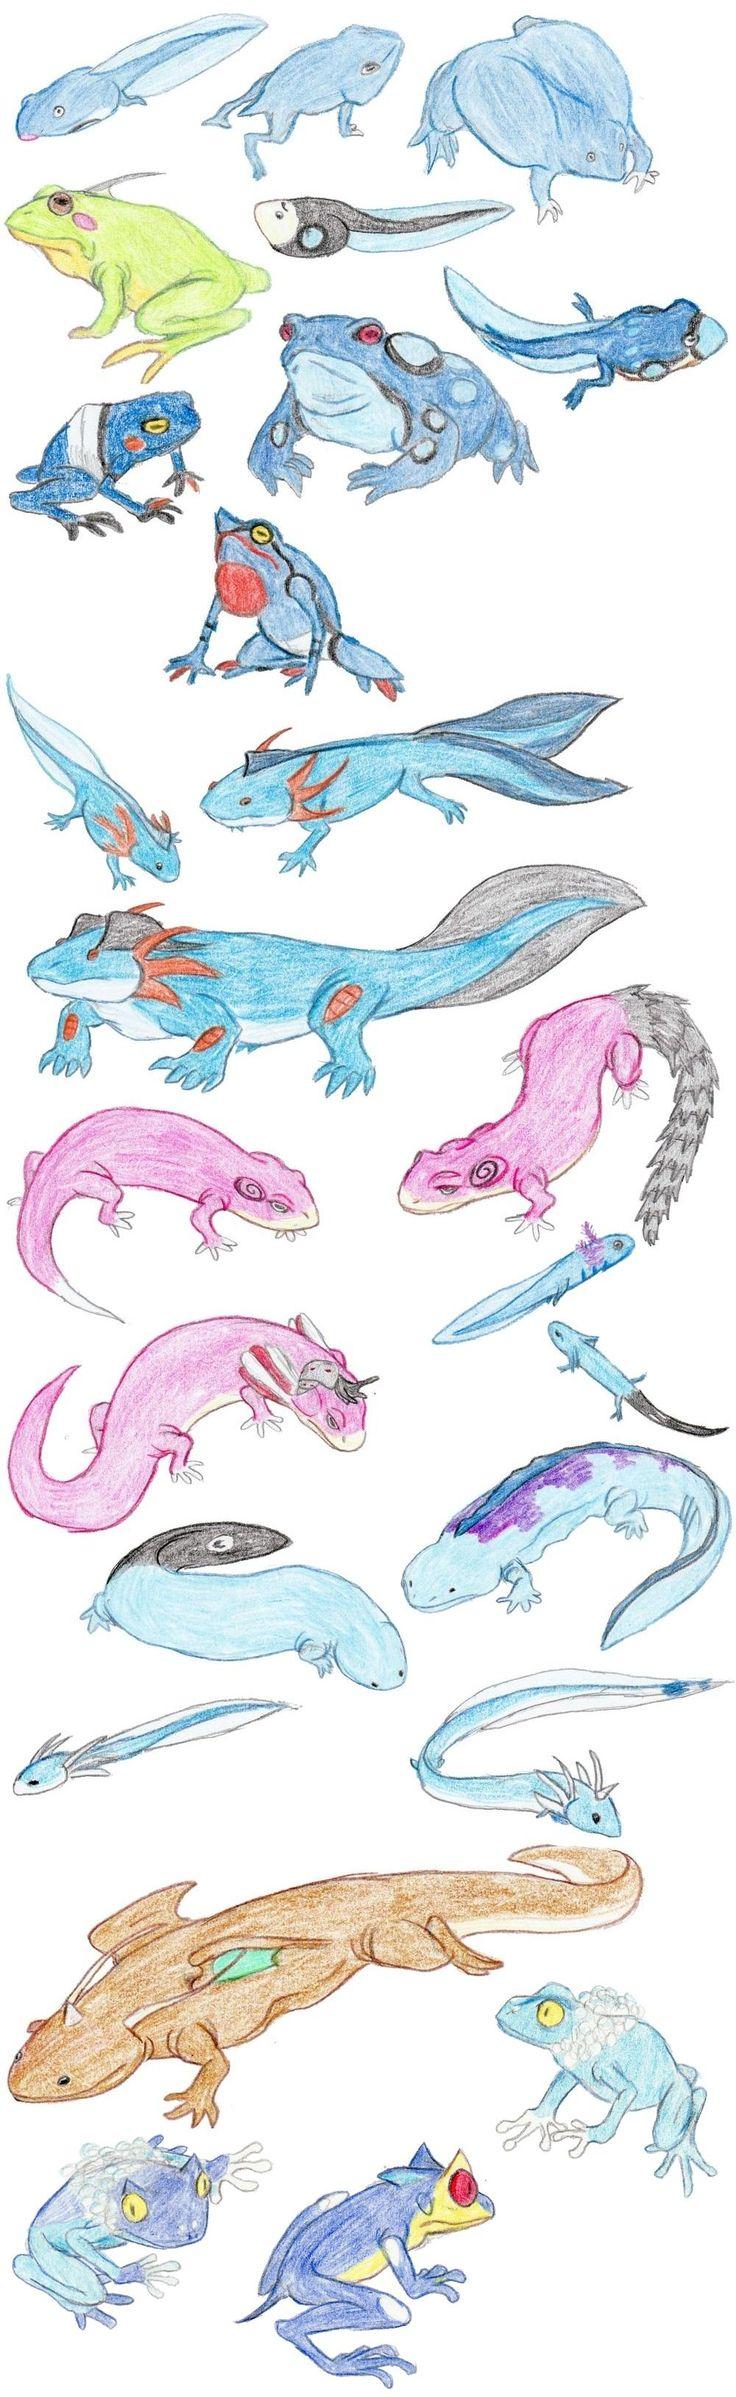 Amphibian Pokemon by DragonlordRynn on deviantART